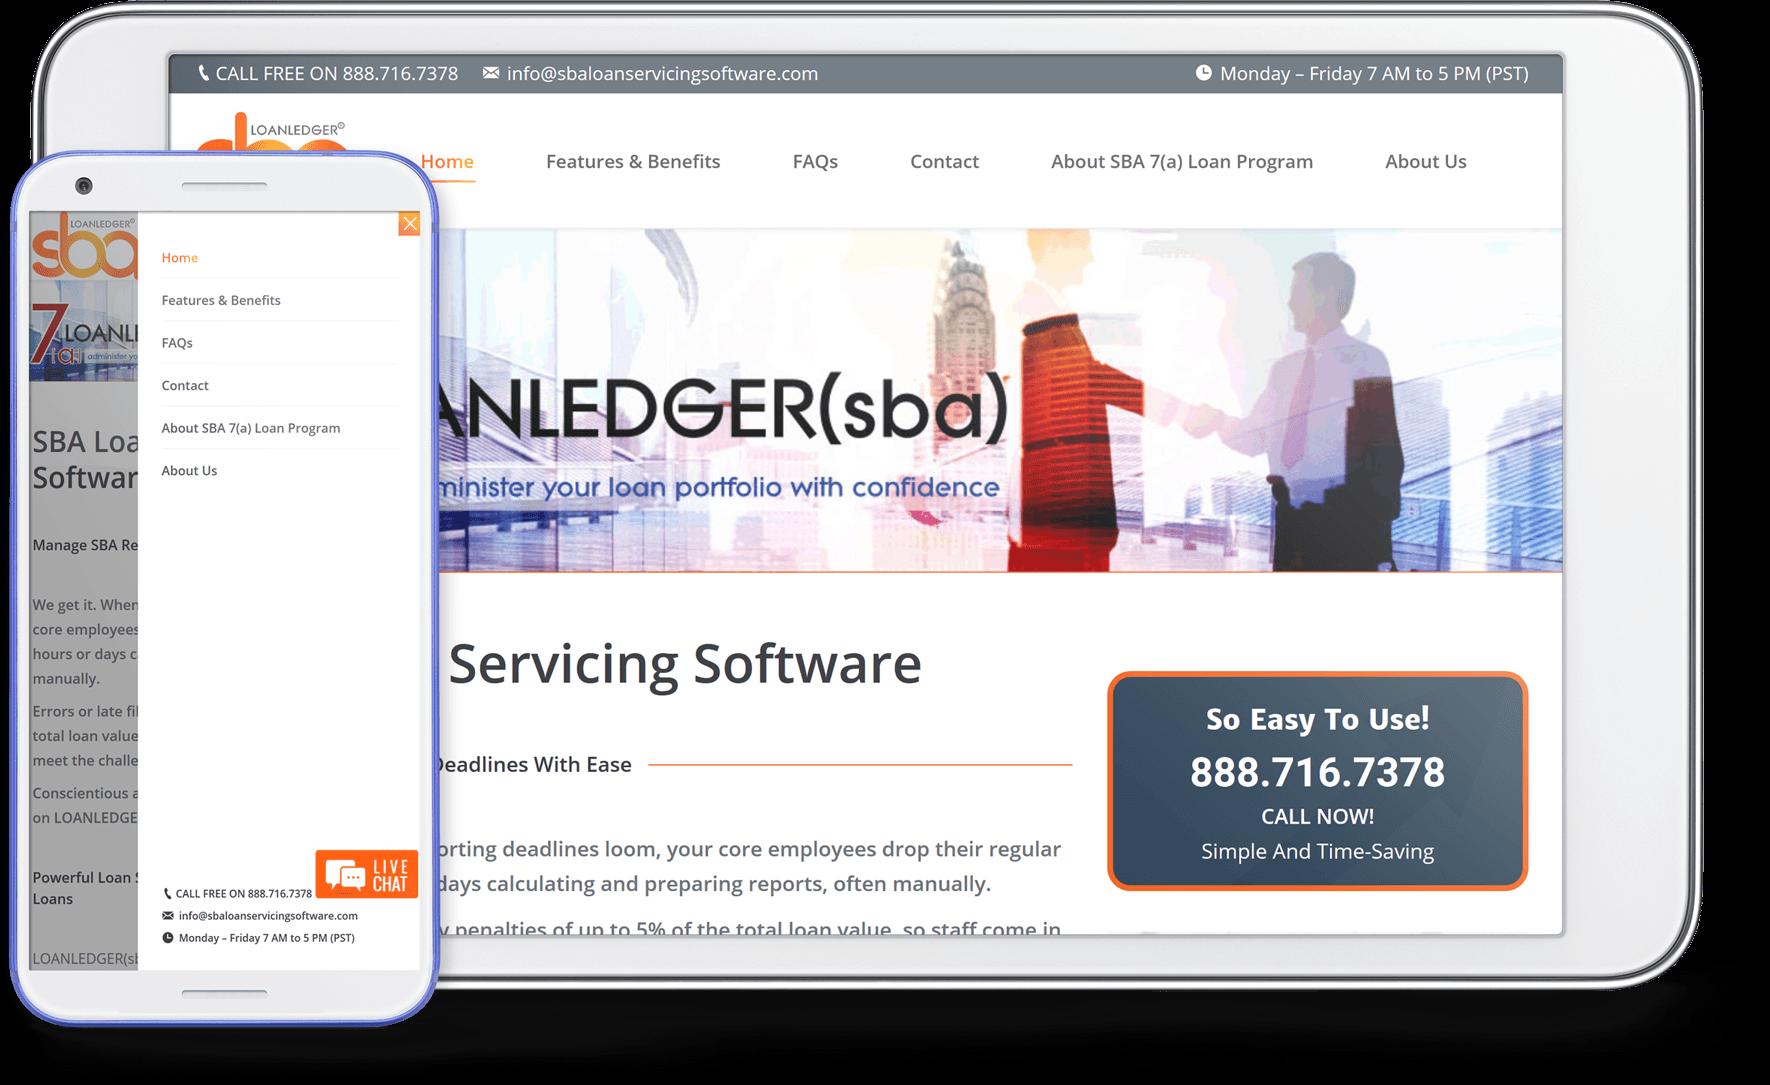 sba loan servicing screenshot mobile